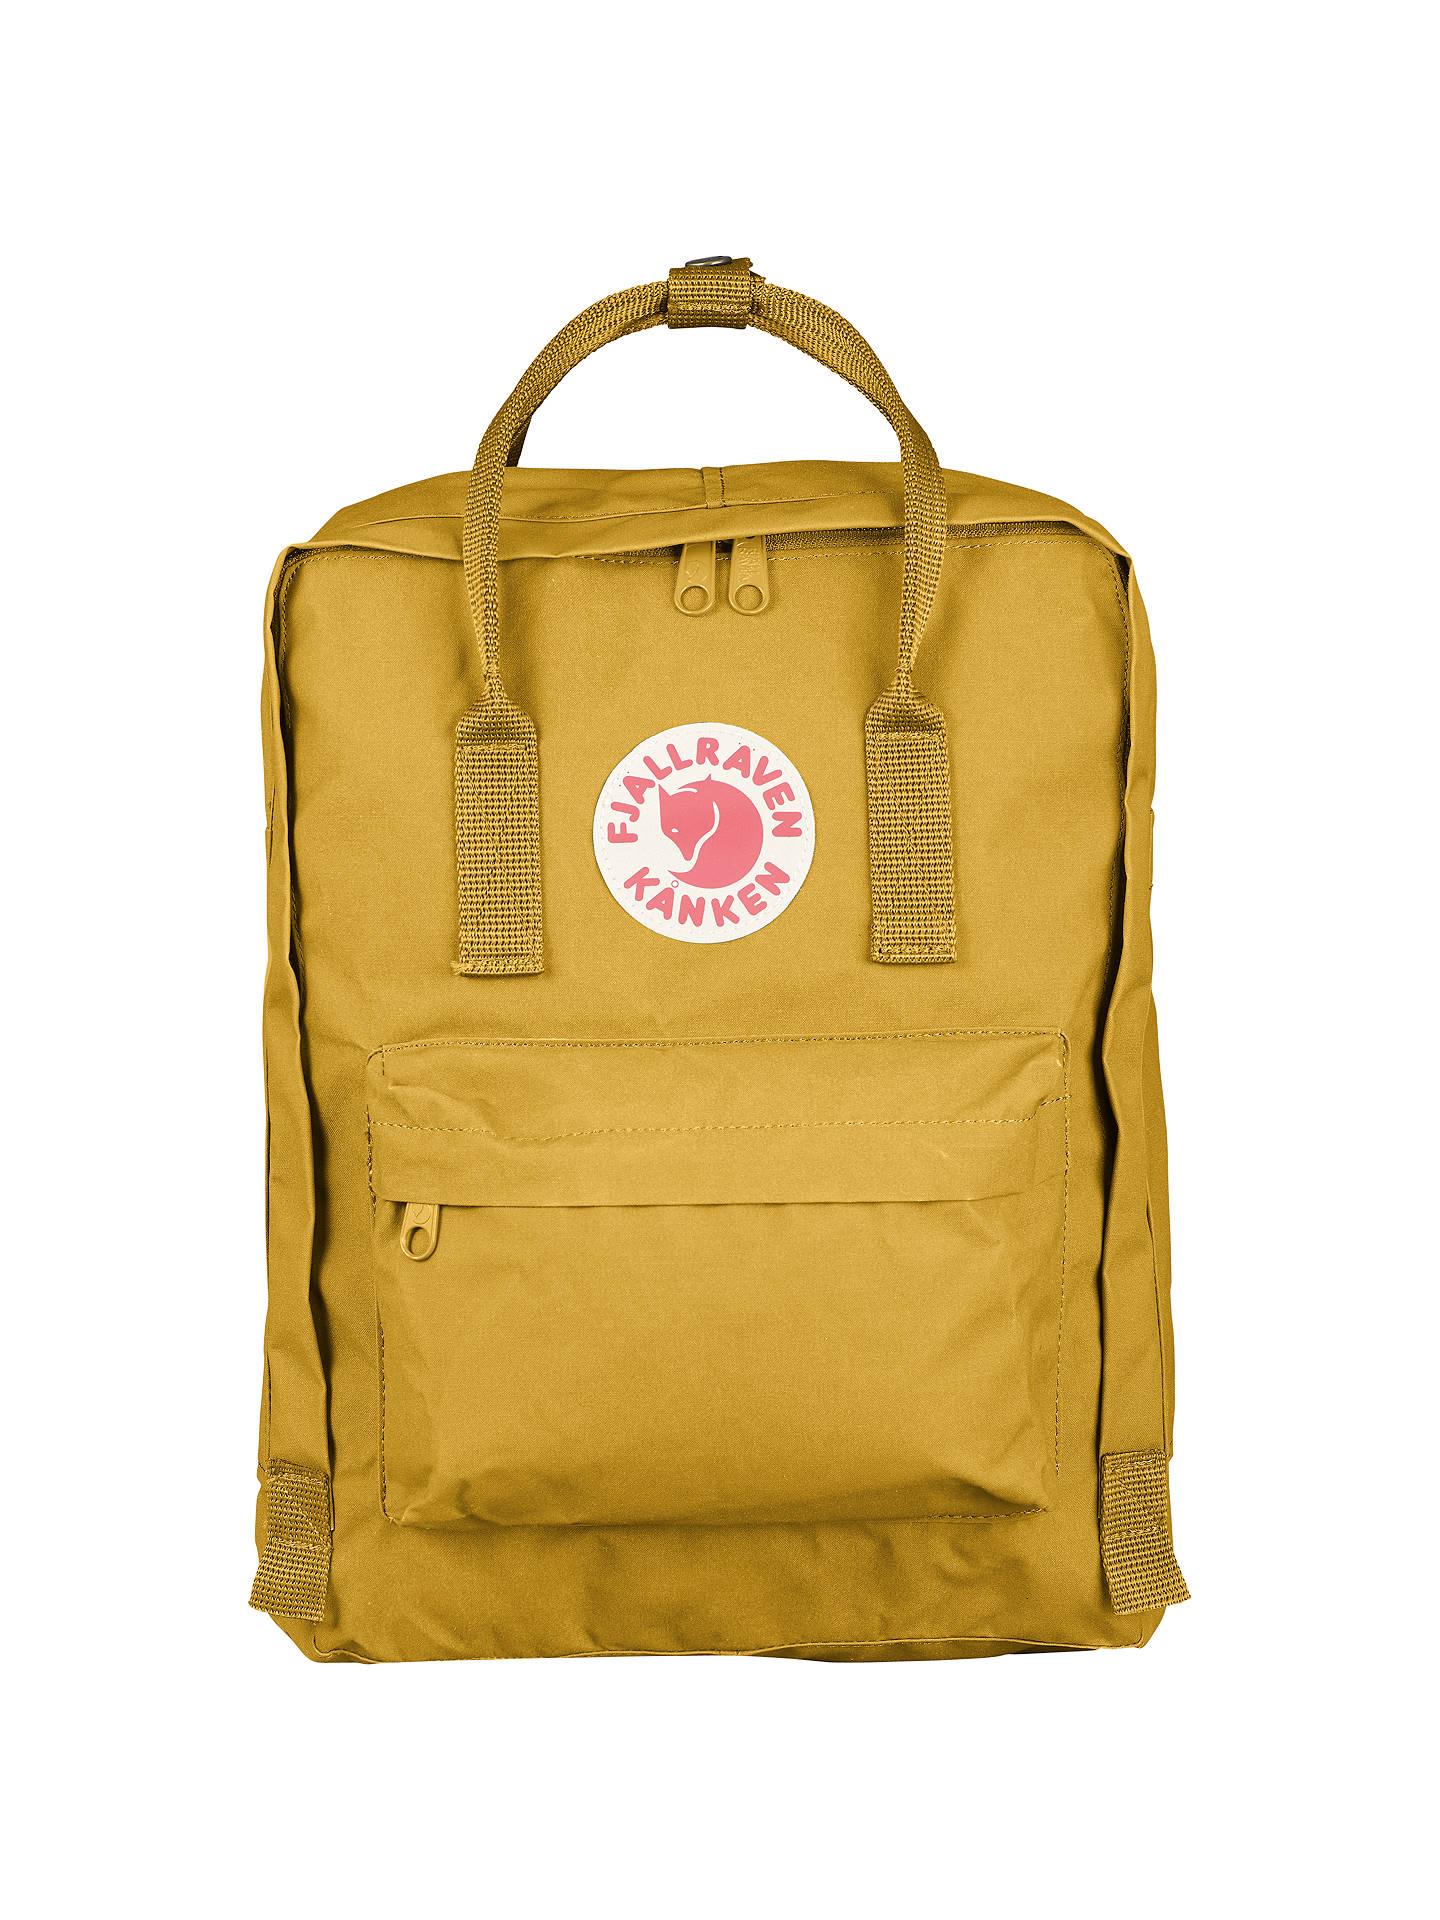 d7221c6709 Buy Fjallraven-Kanken Classic Backpack